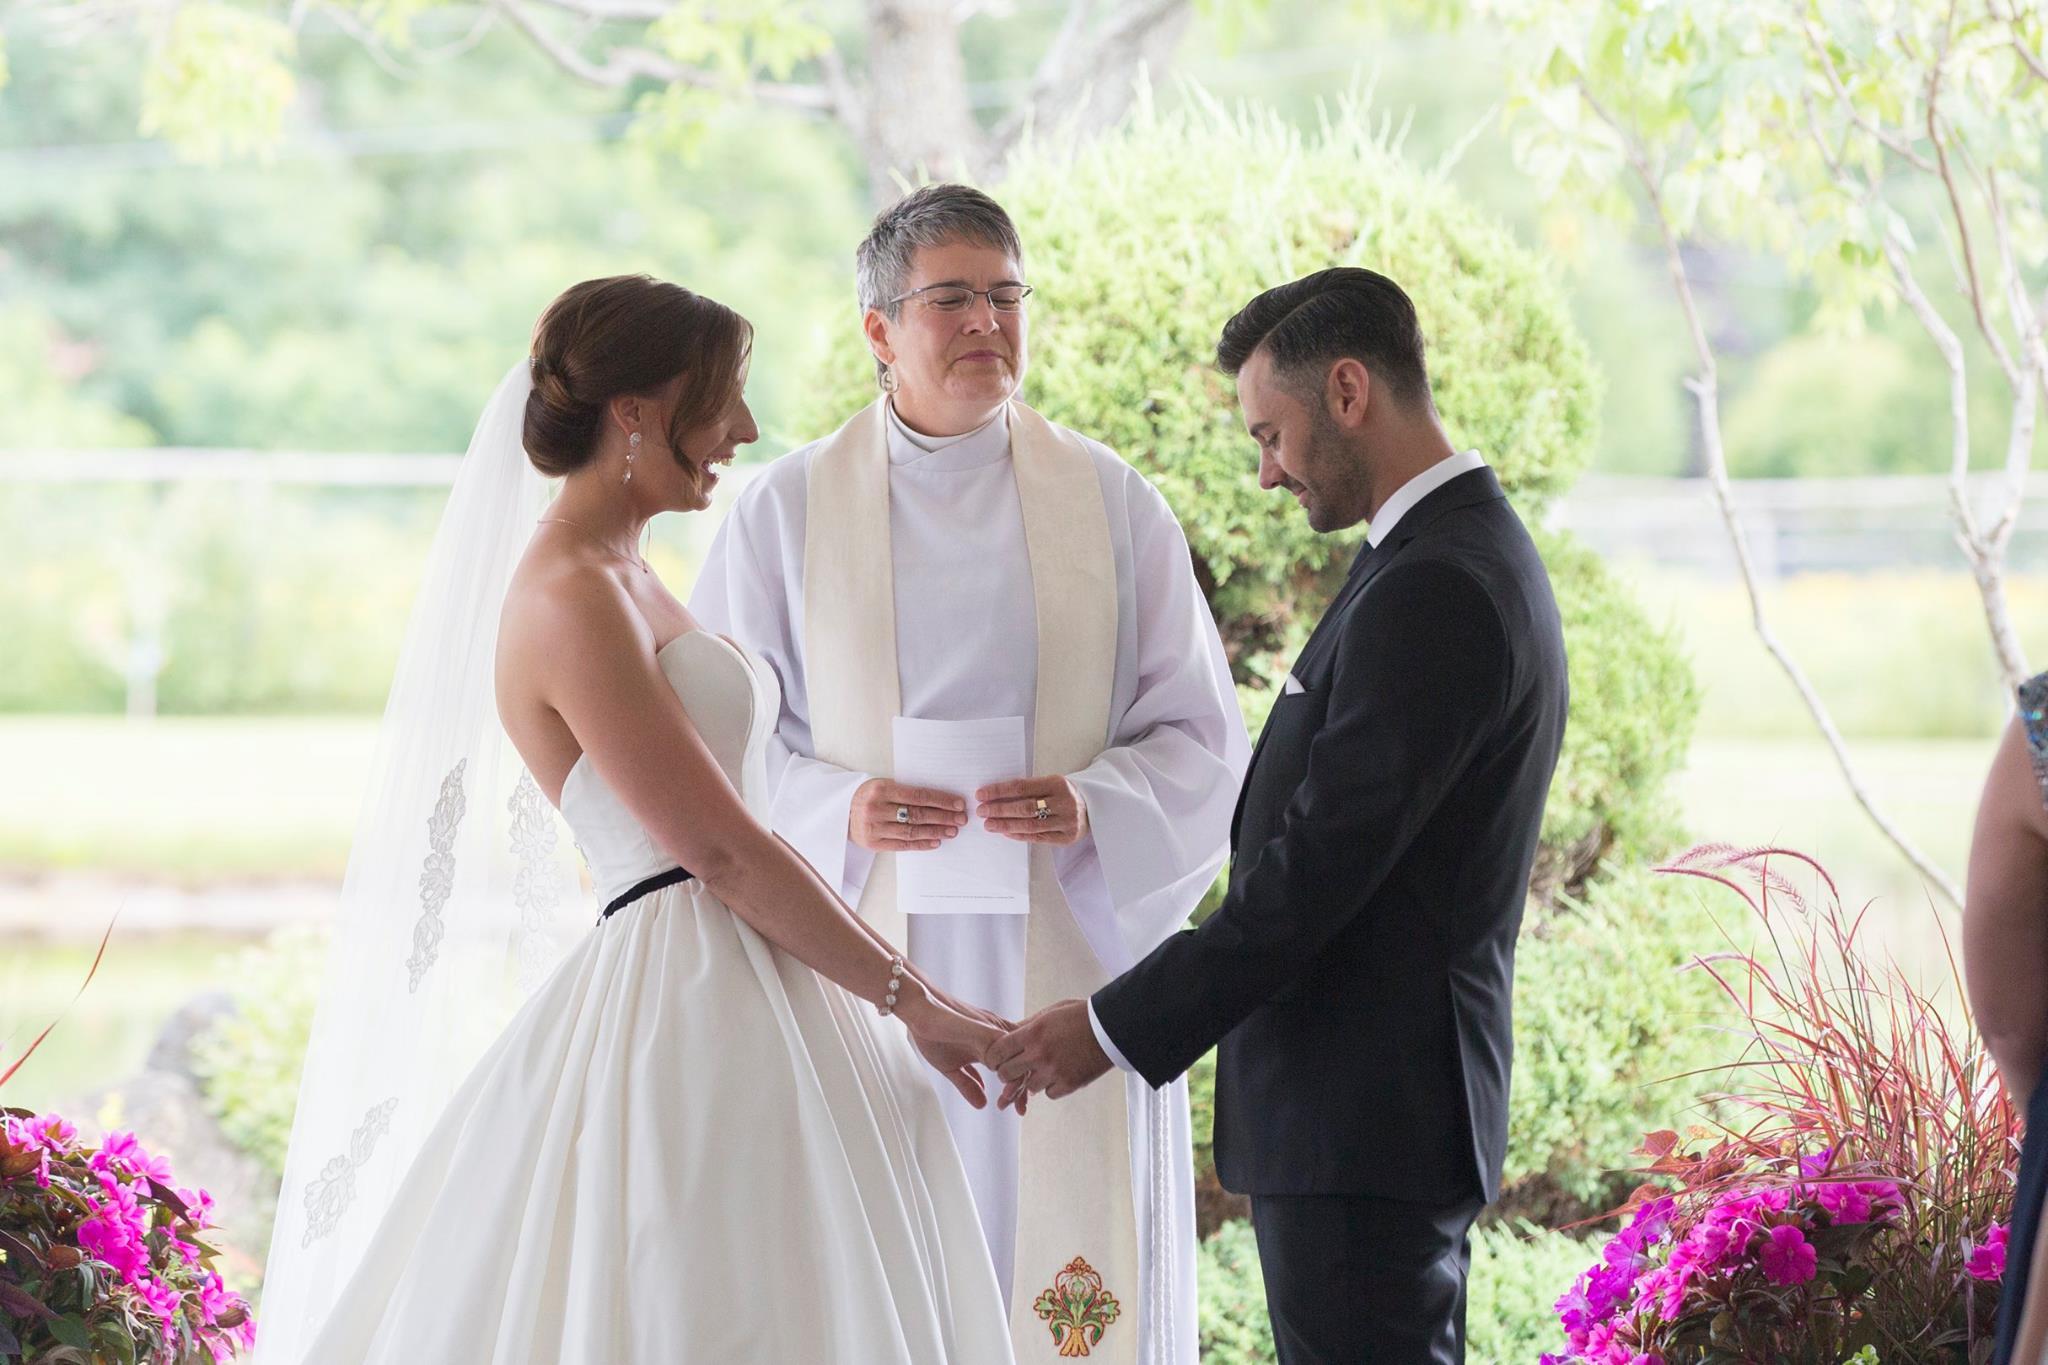 Outdoor wedding ceremony Ottawa